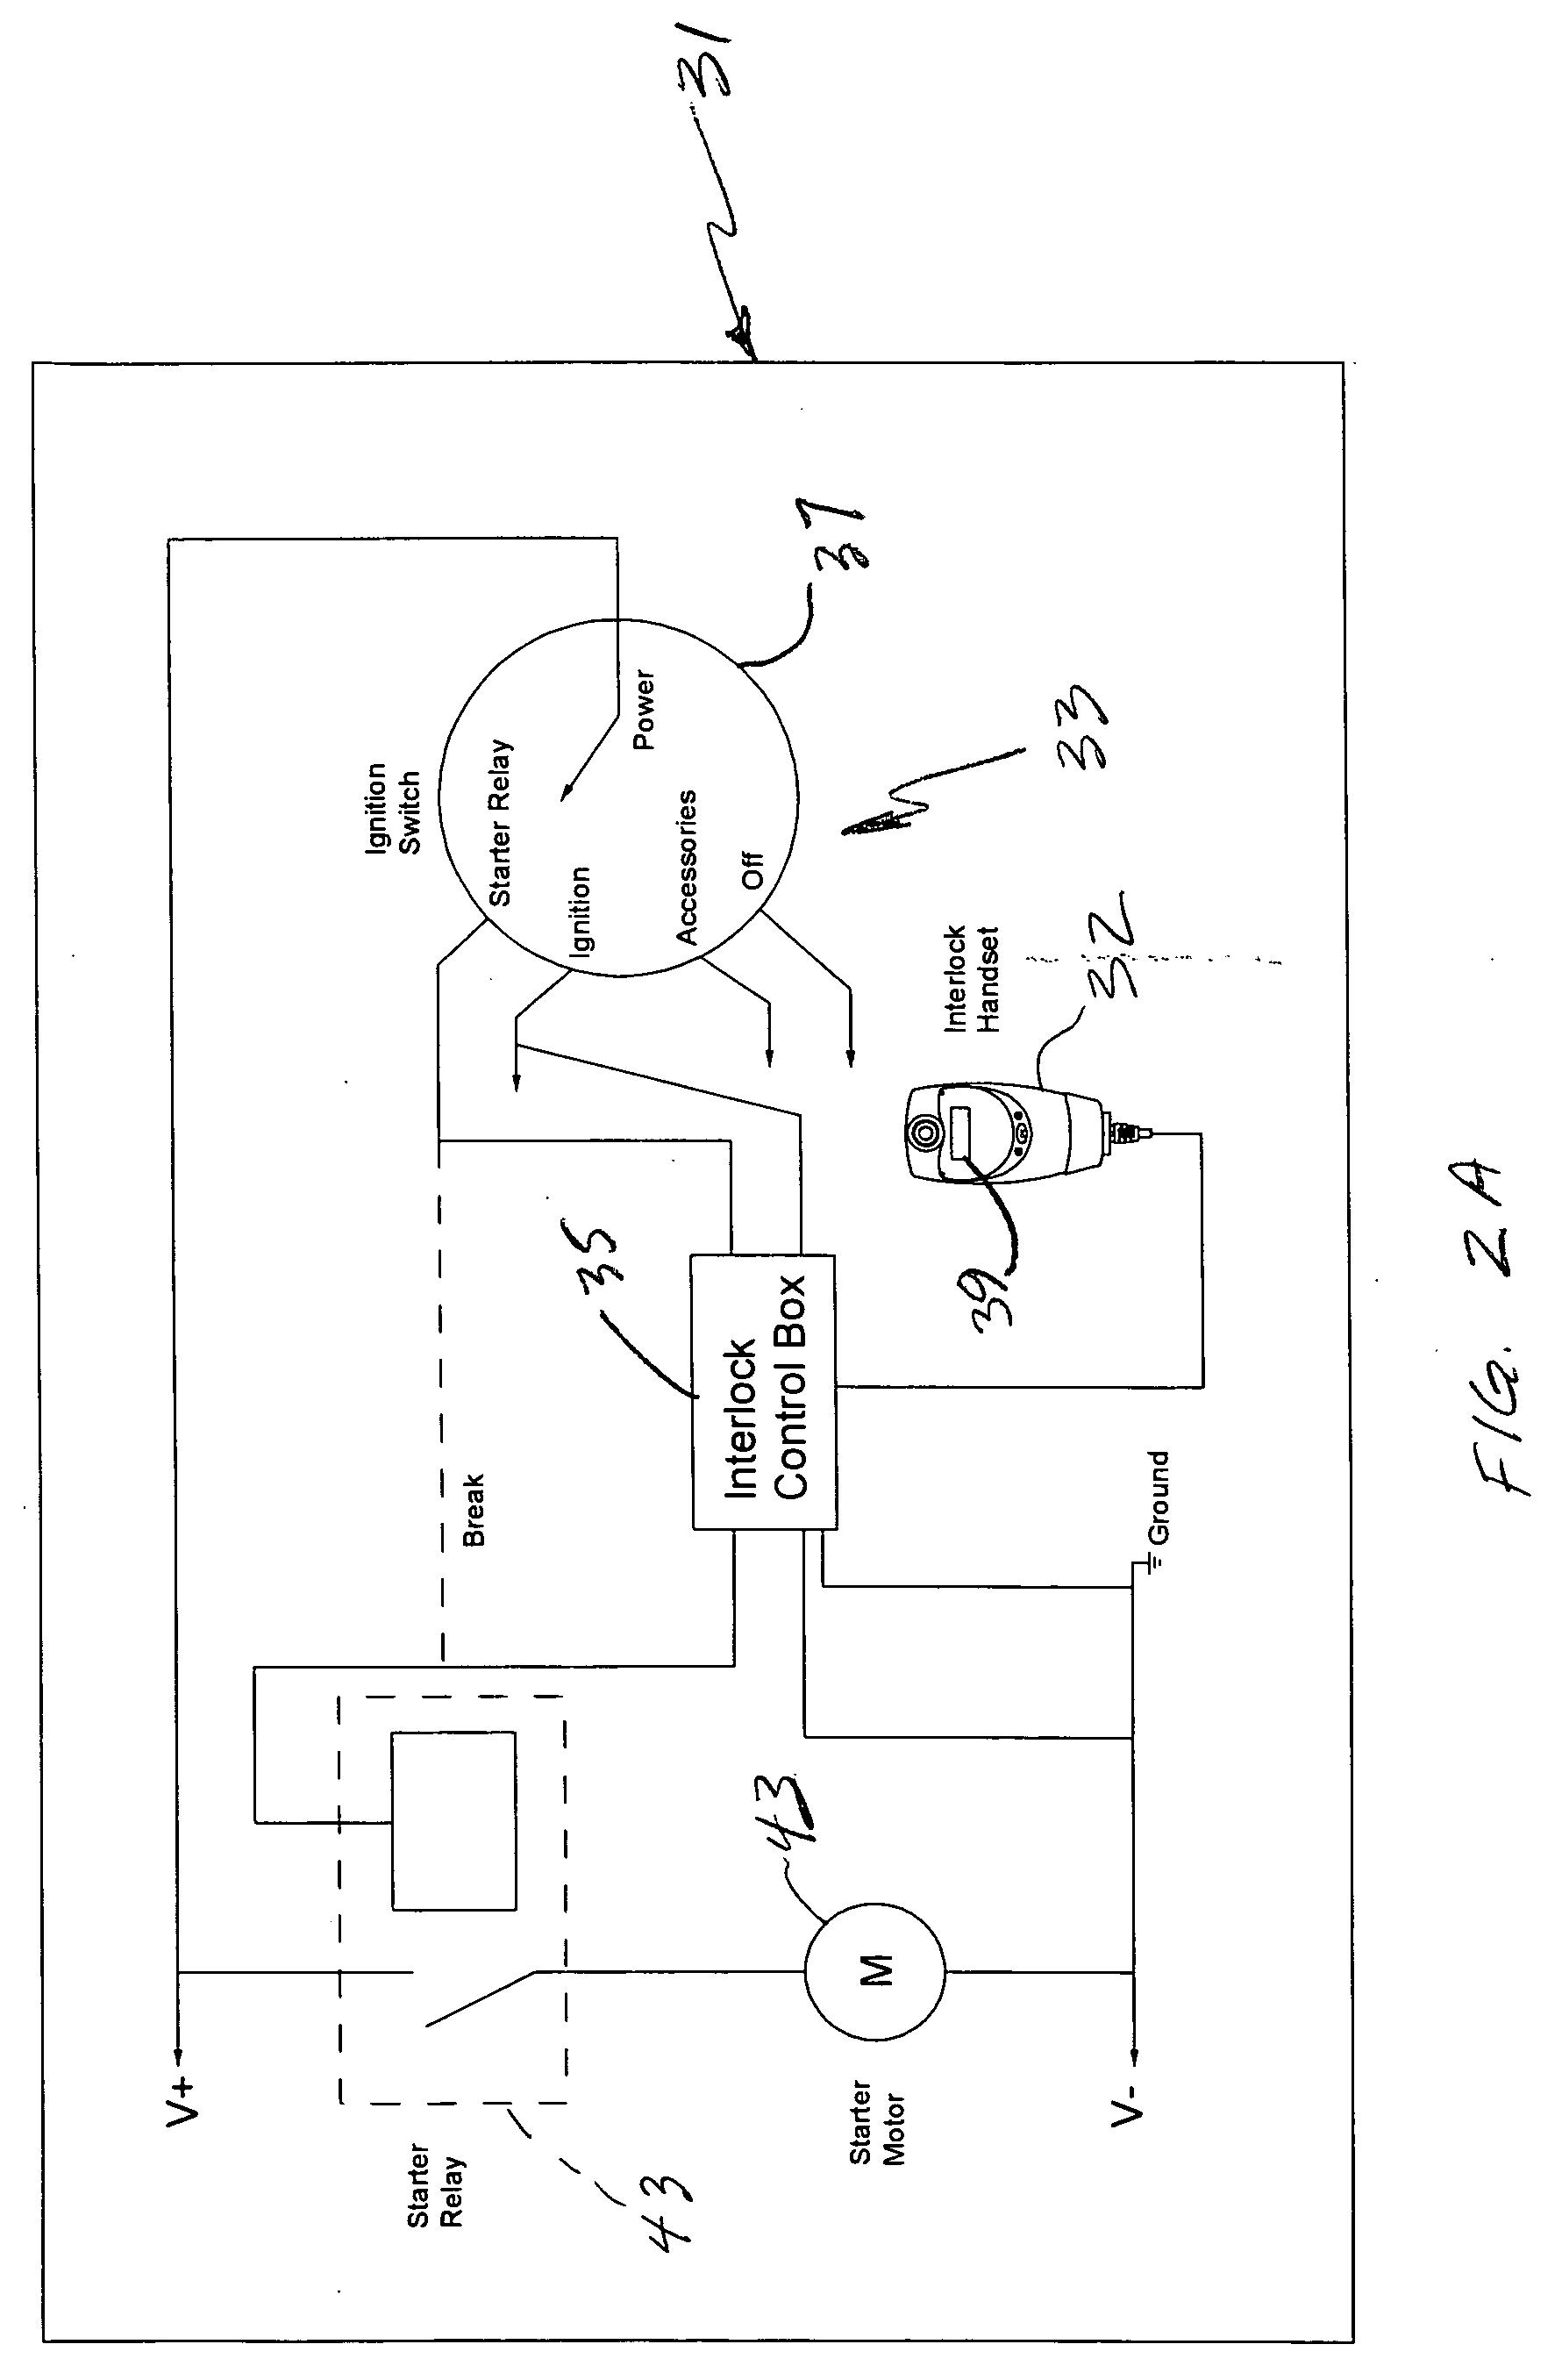 Patent Us20080227466 - Modular Gps System For Breathalyzer Interlock